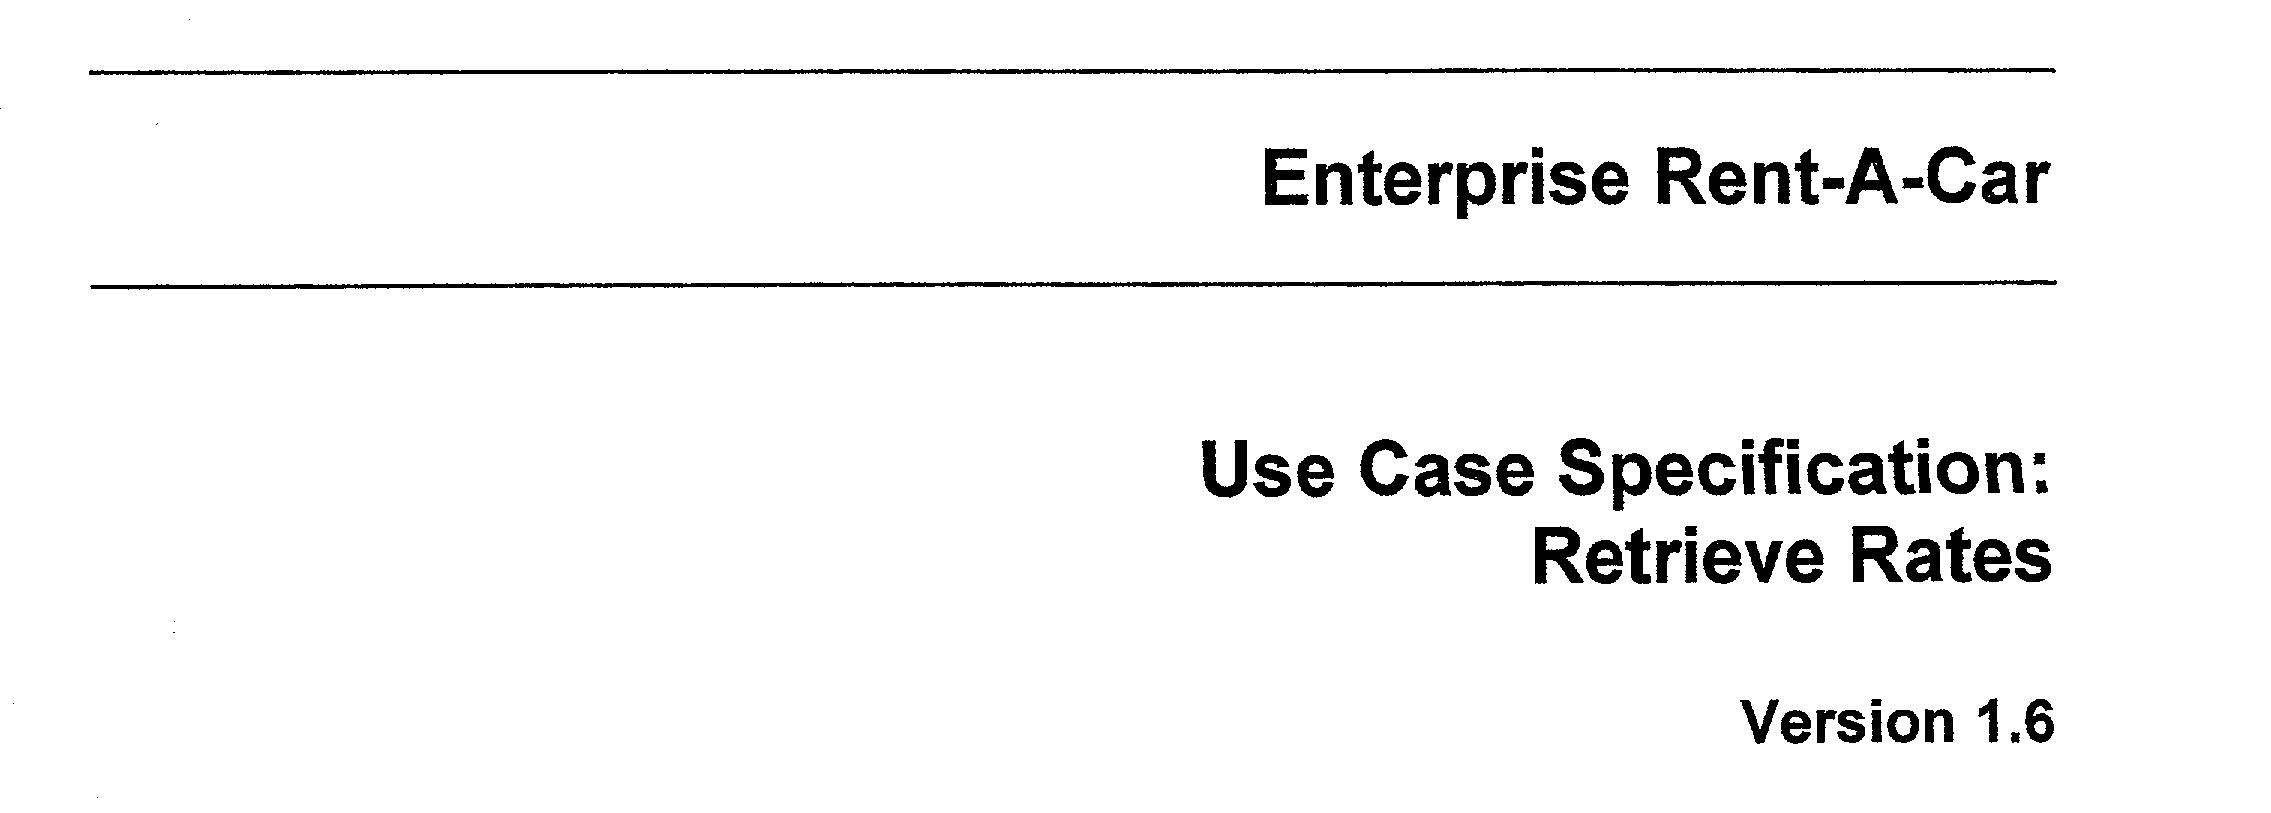 Figure US20030125992A1-20030703-P01682